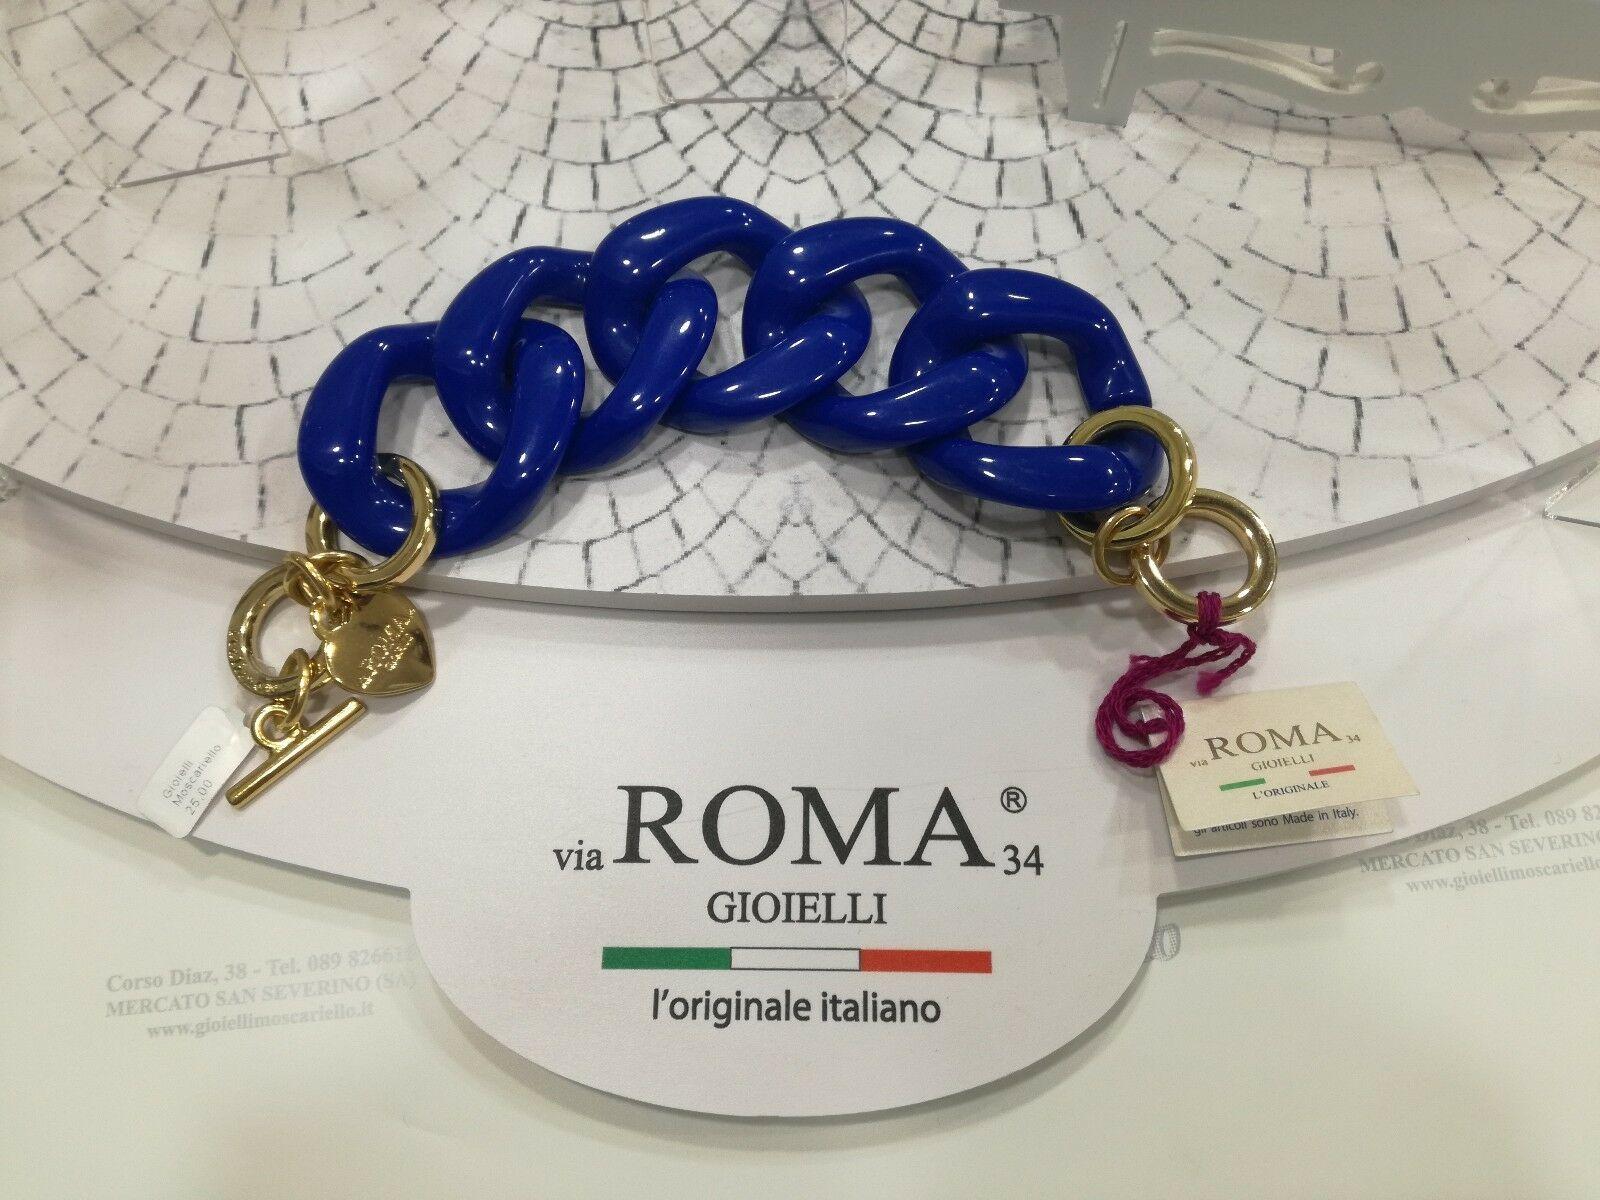 Bracciale Via Roma Gioielli Serie arcobaleno Blu